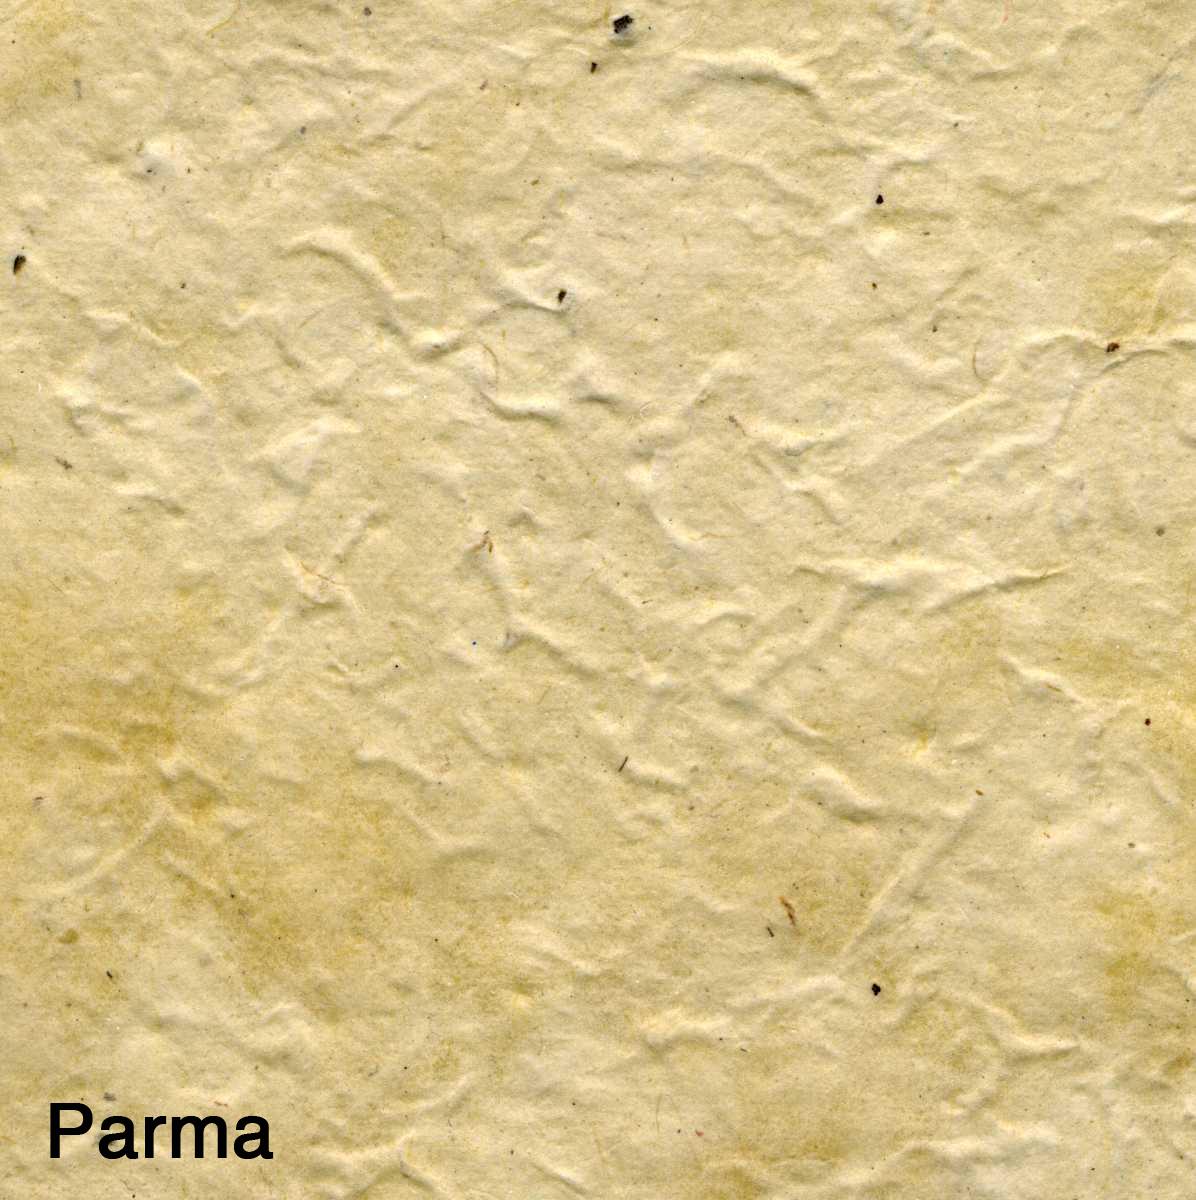 Parma001.jpg